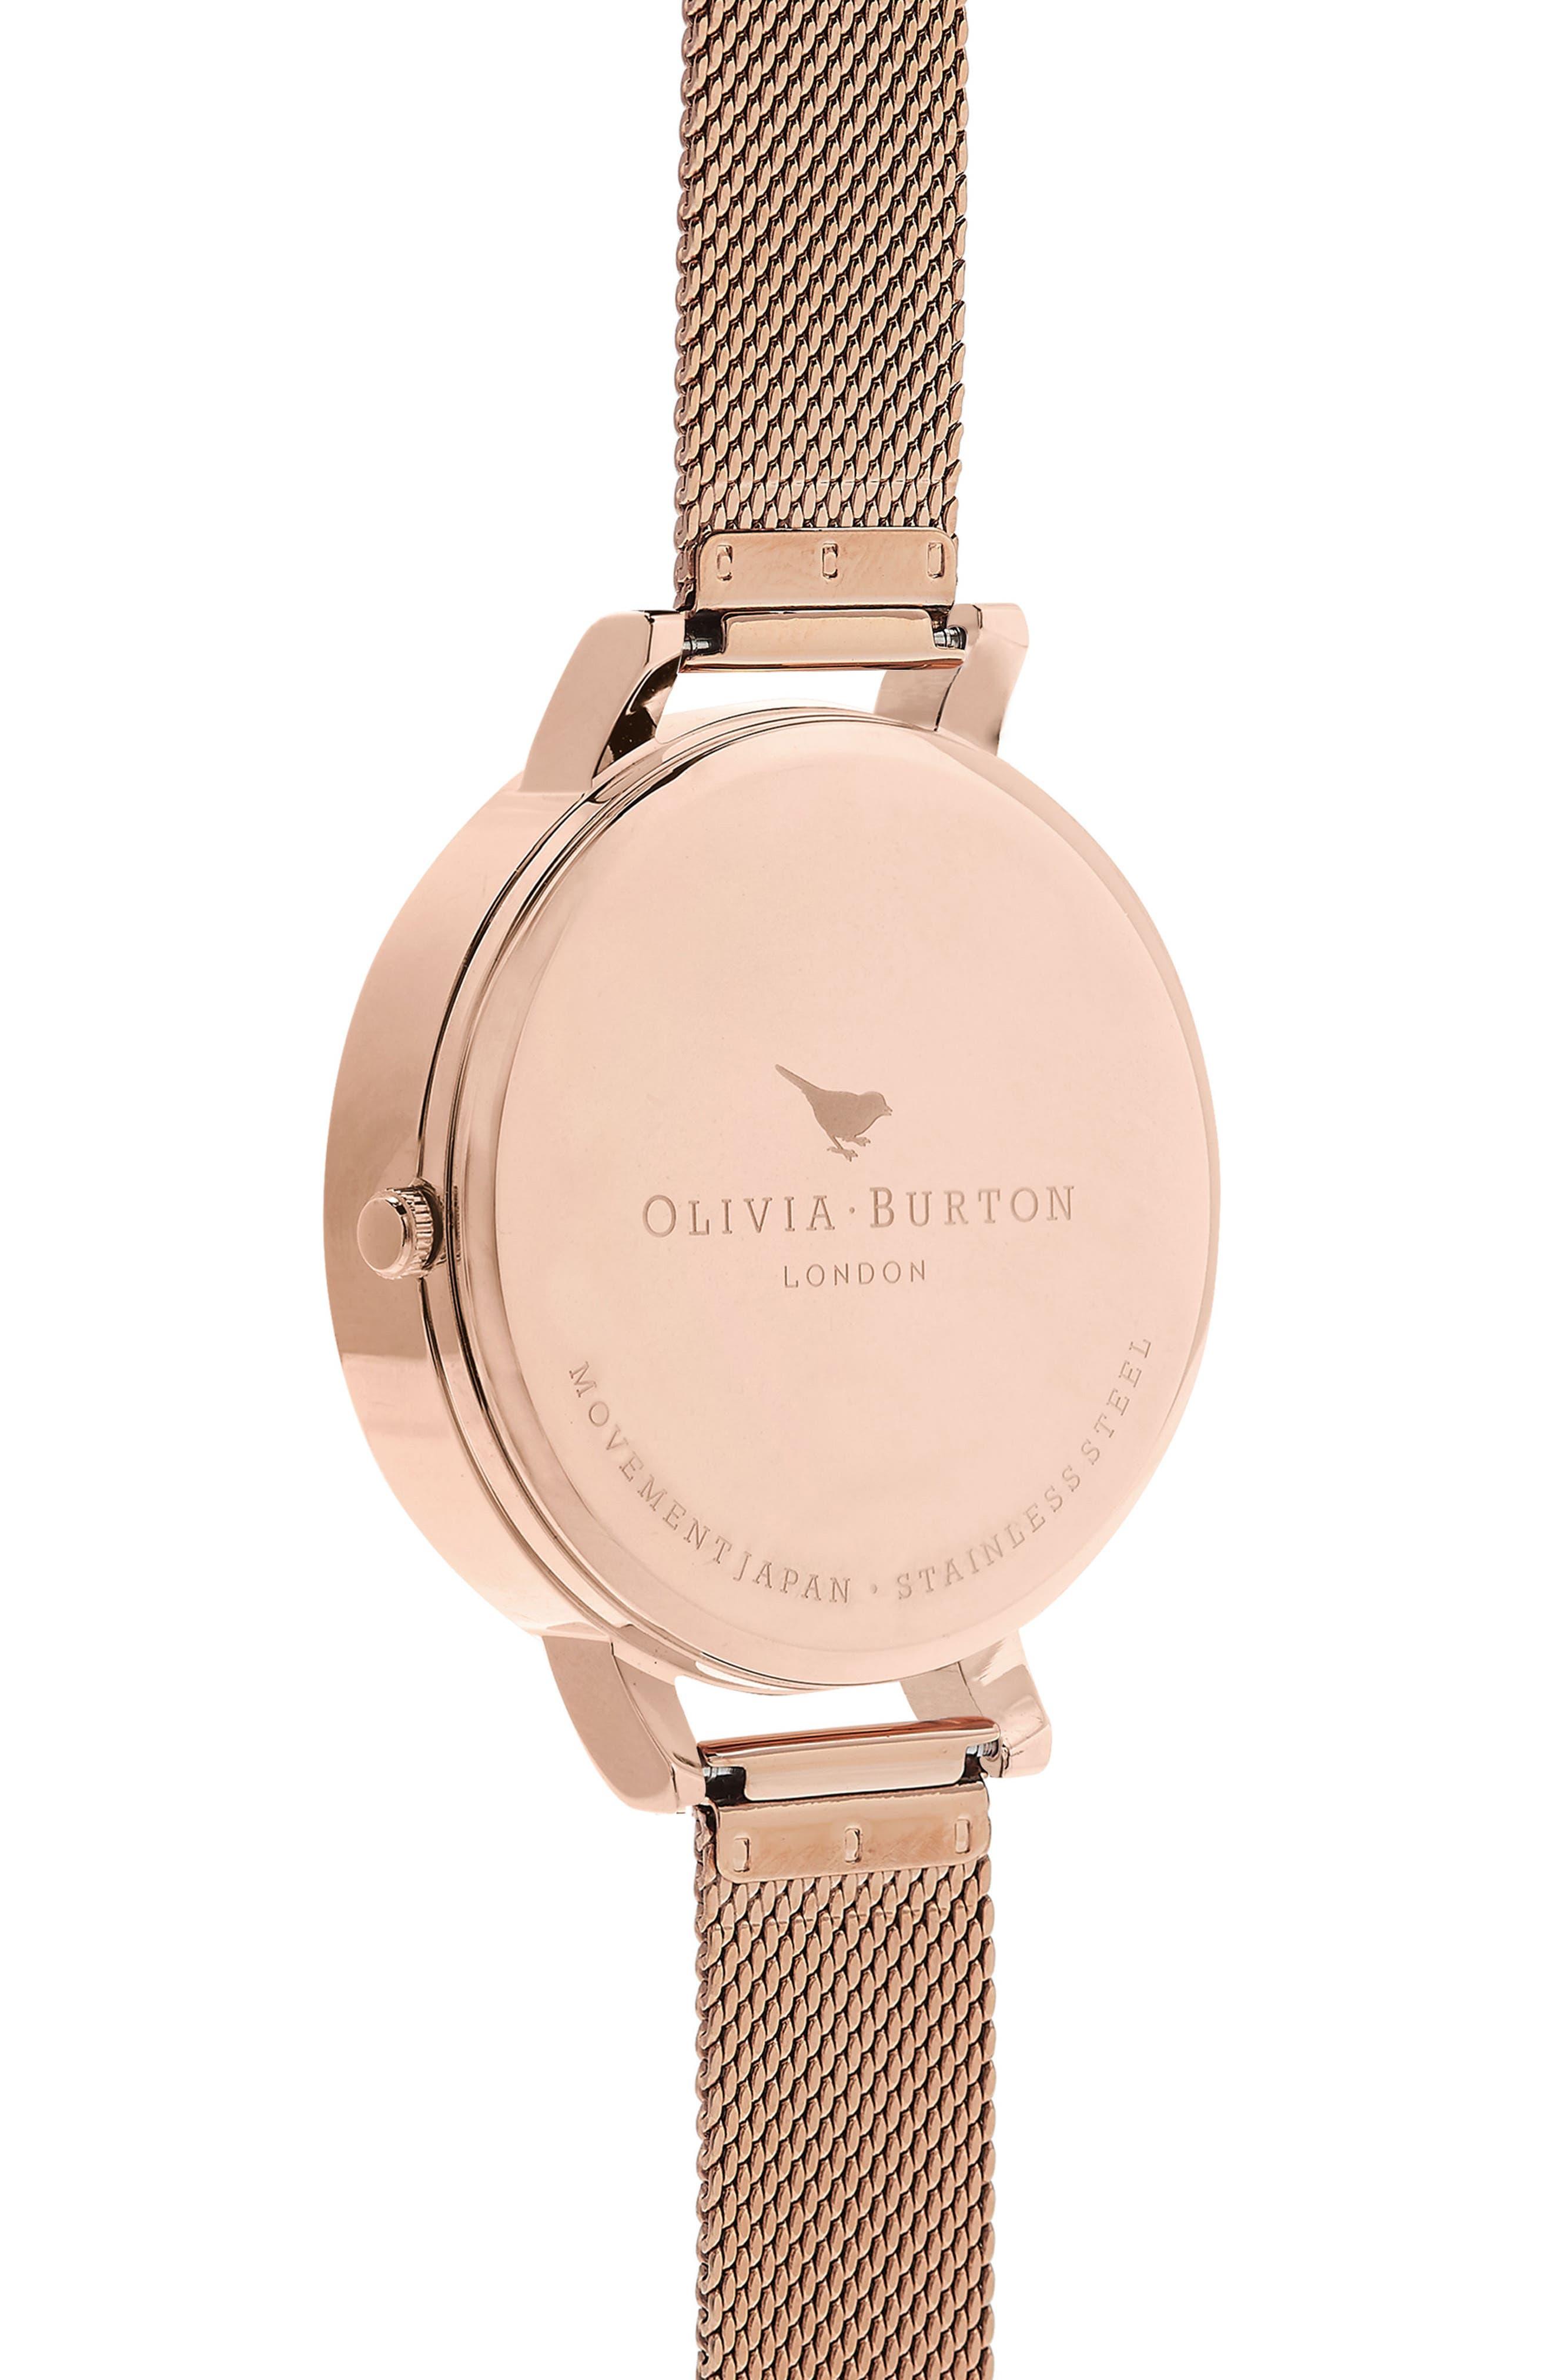 OLIVIA BURTON, Mesh Strap Watch, 38mm, Alternate thumbnail 3, color, ROSE GOLD